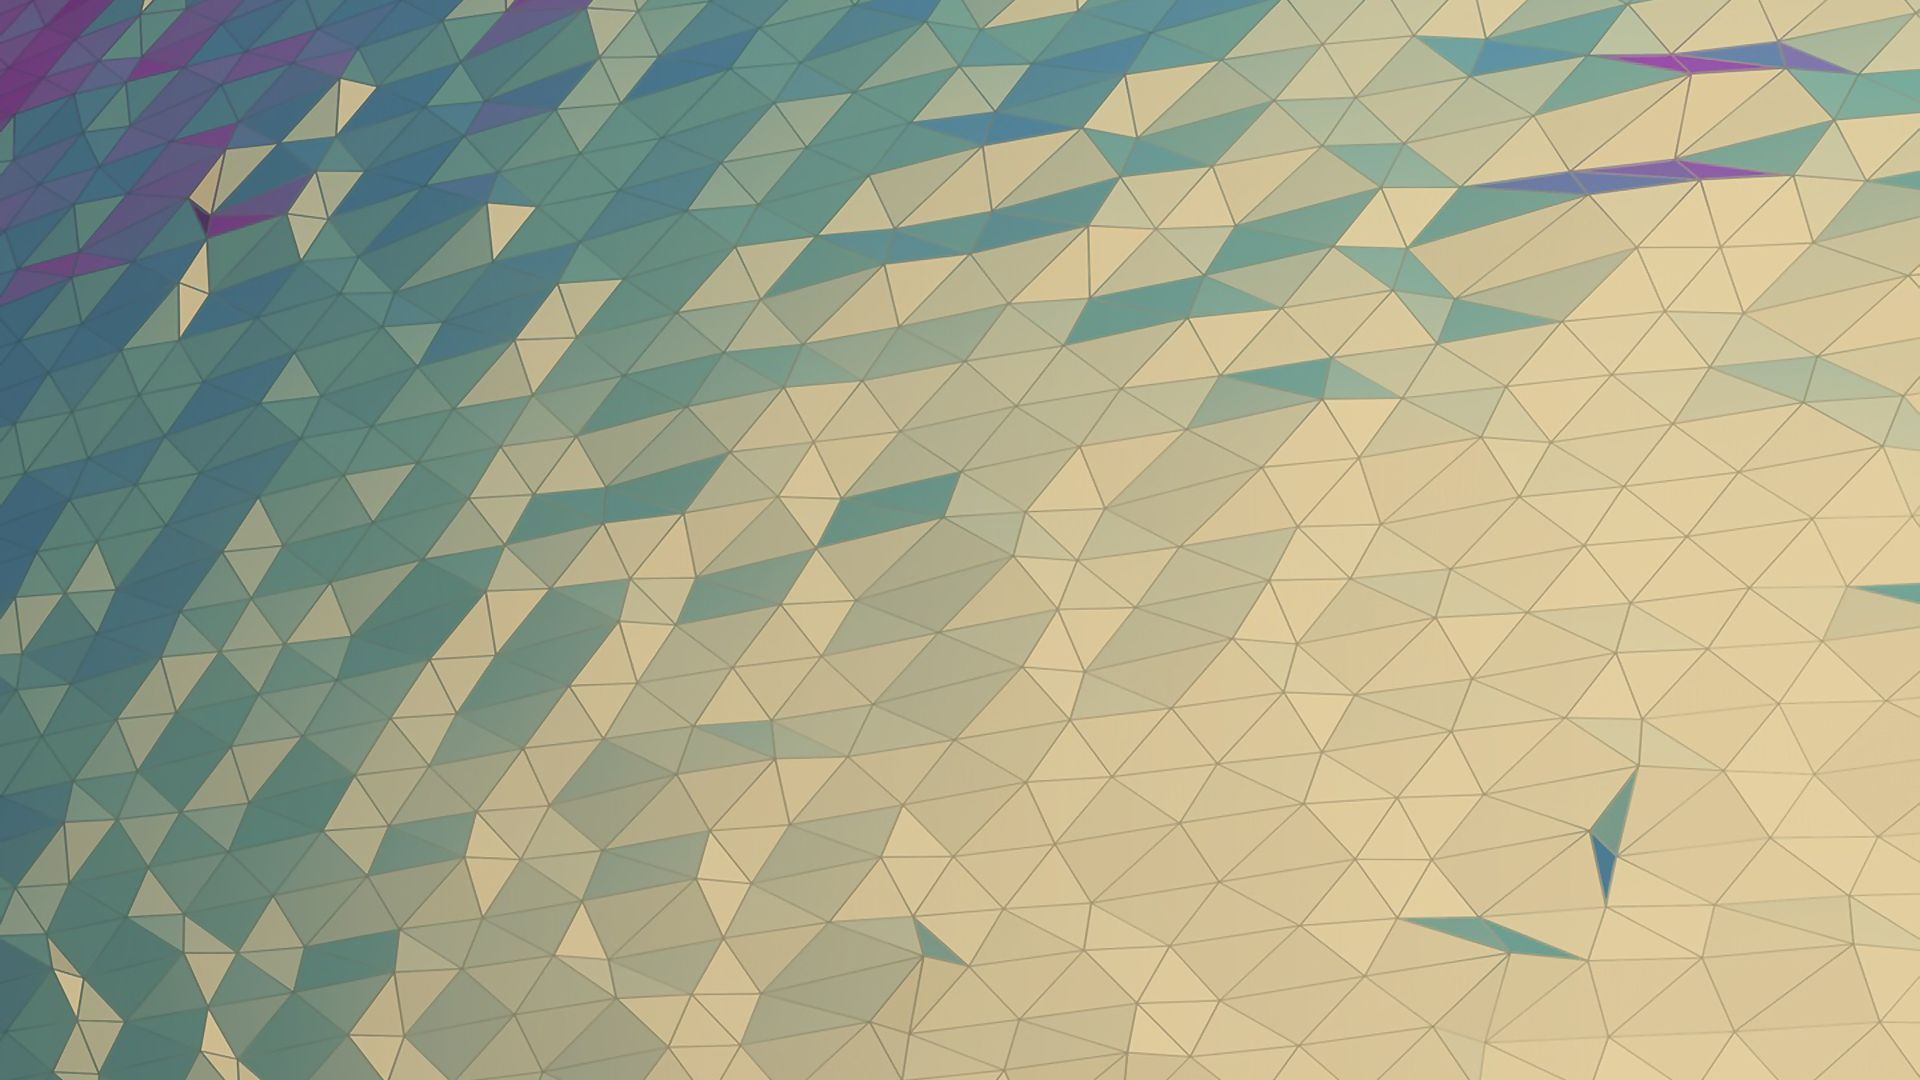 Geometric Abstract Wallpaper Wallpapersafari Plant